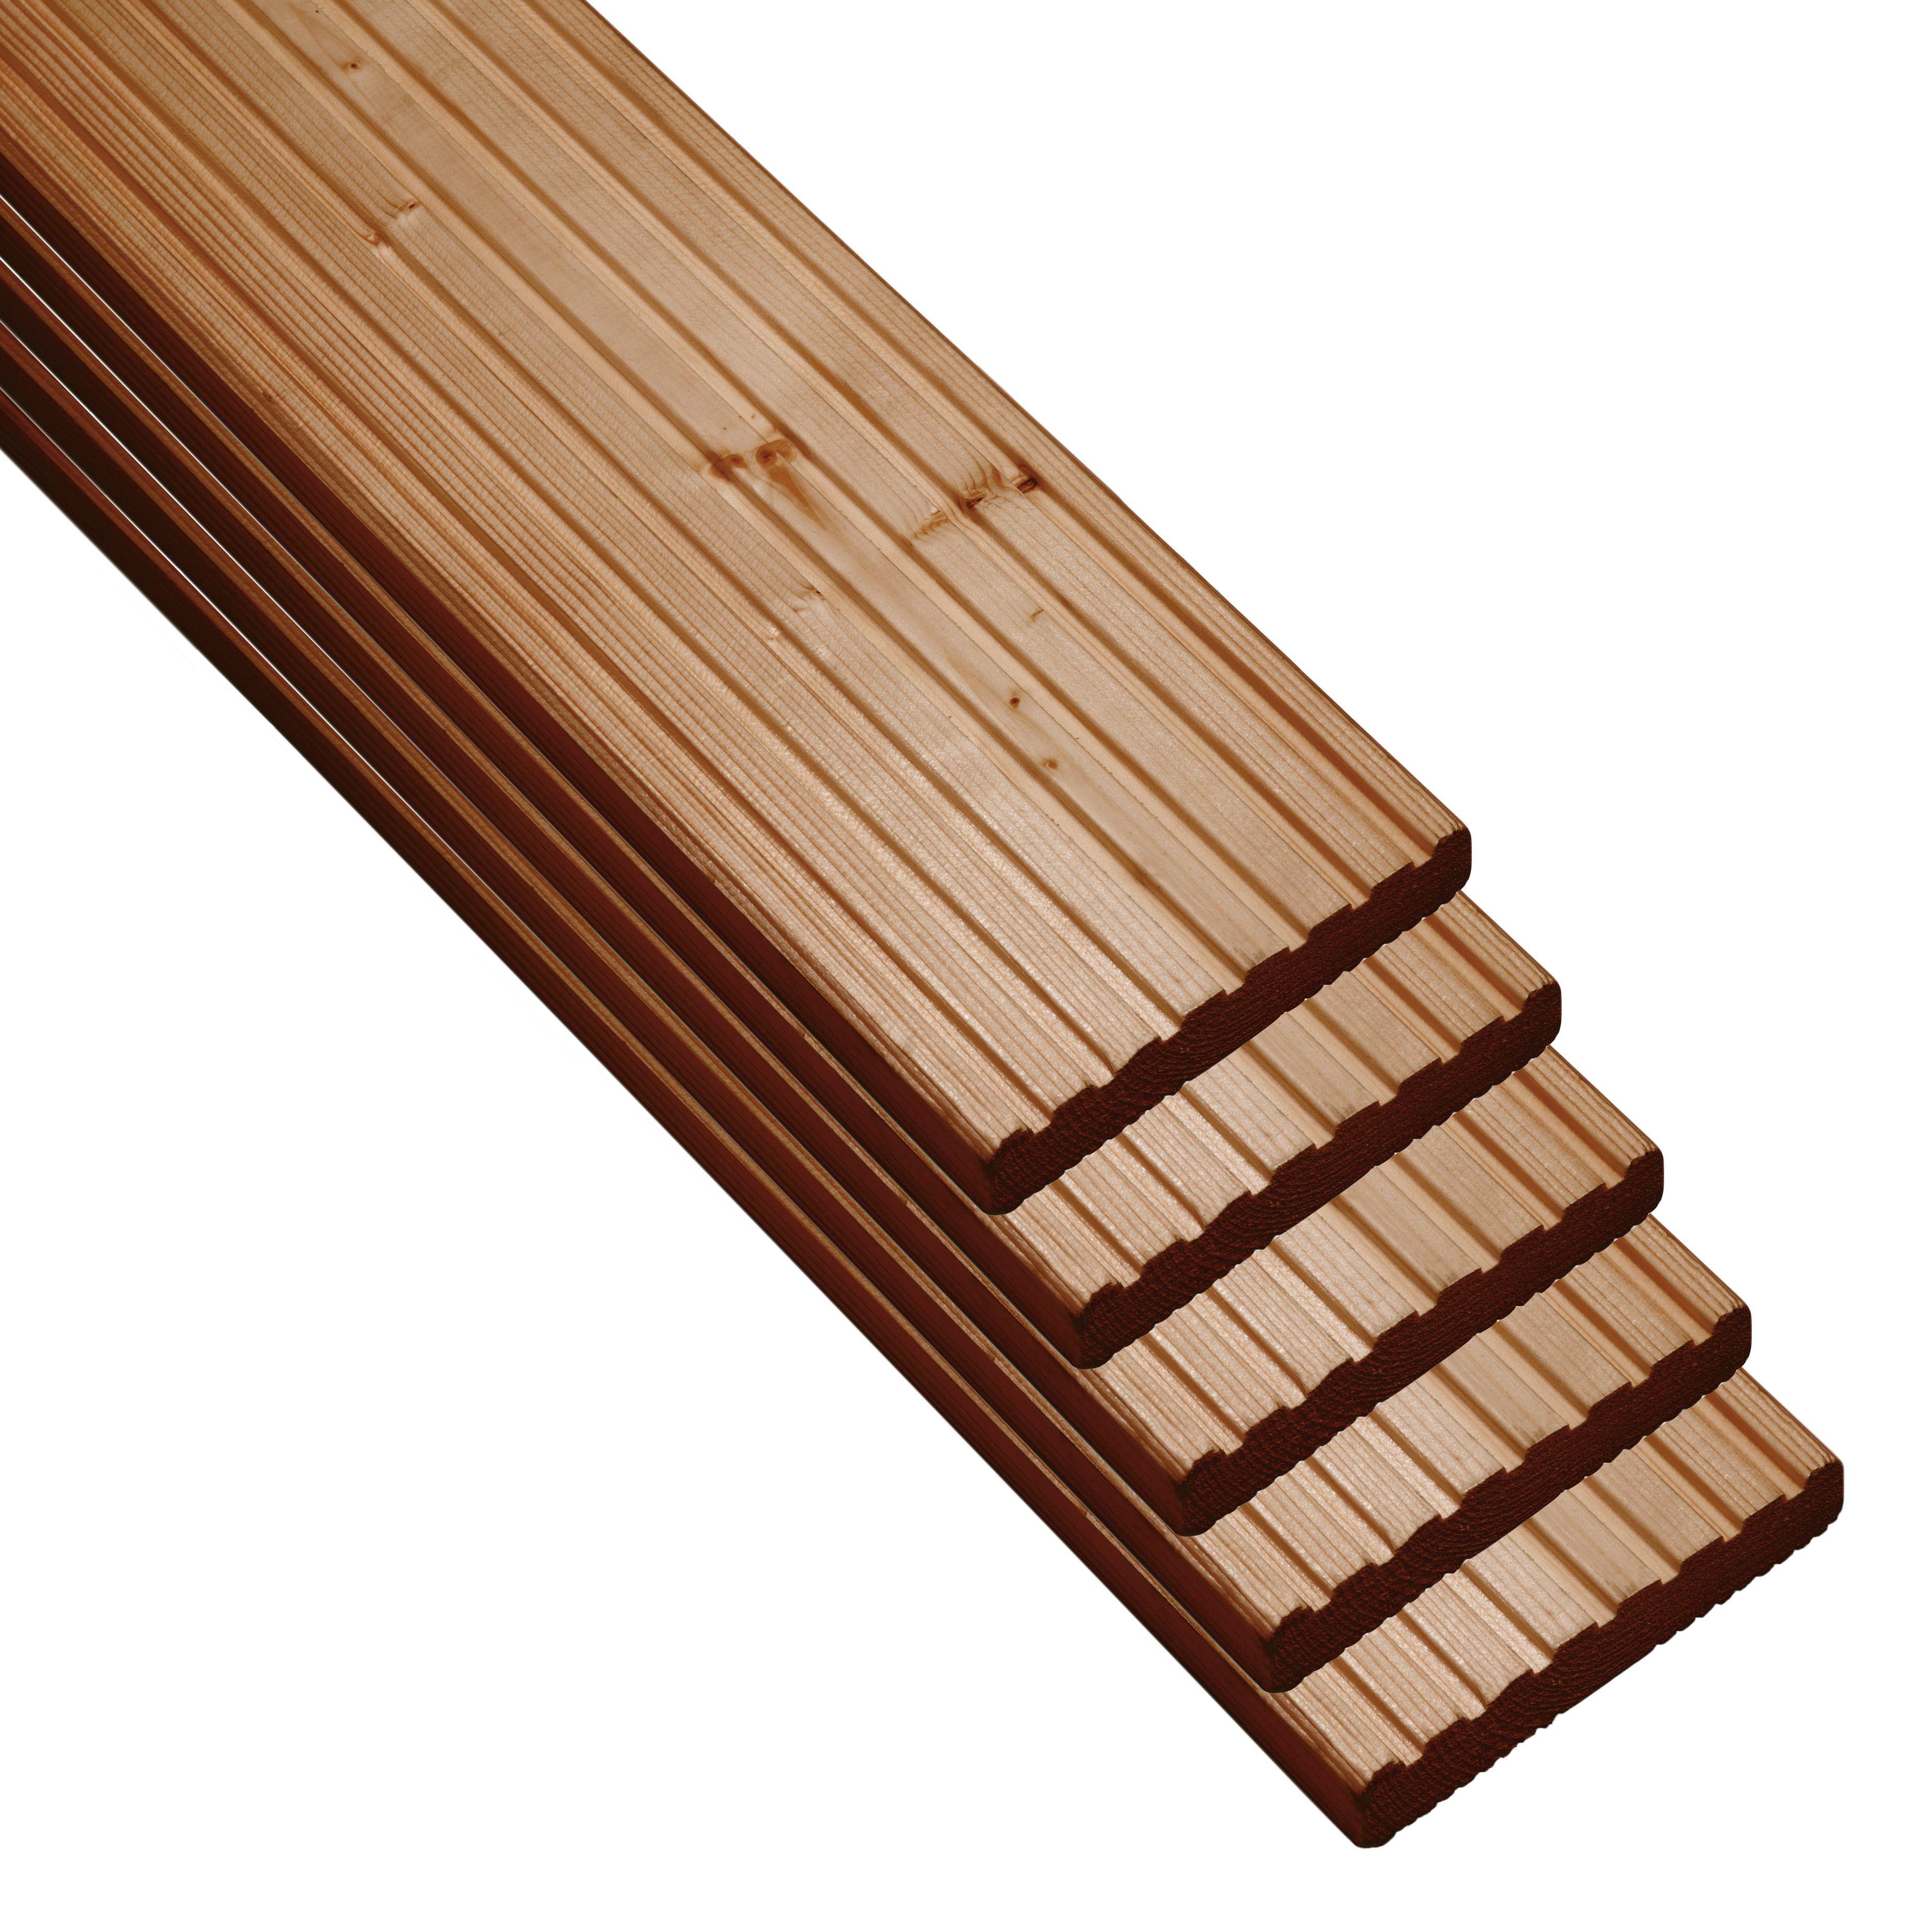 Nevou Premium Brown Deck Board (t)27mm (w)144mm (l)2400mm, Pack Of 5